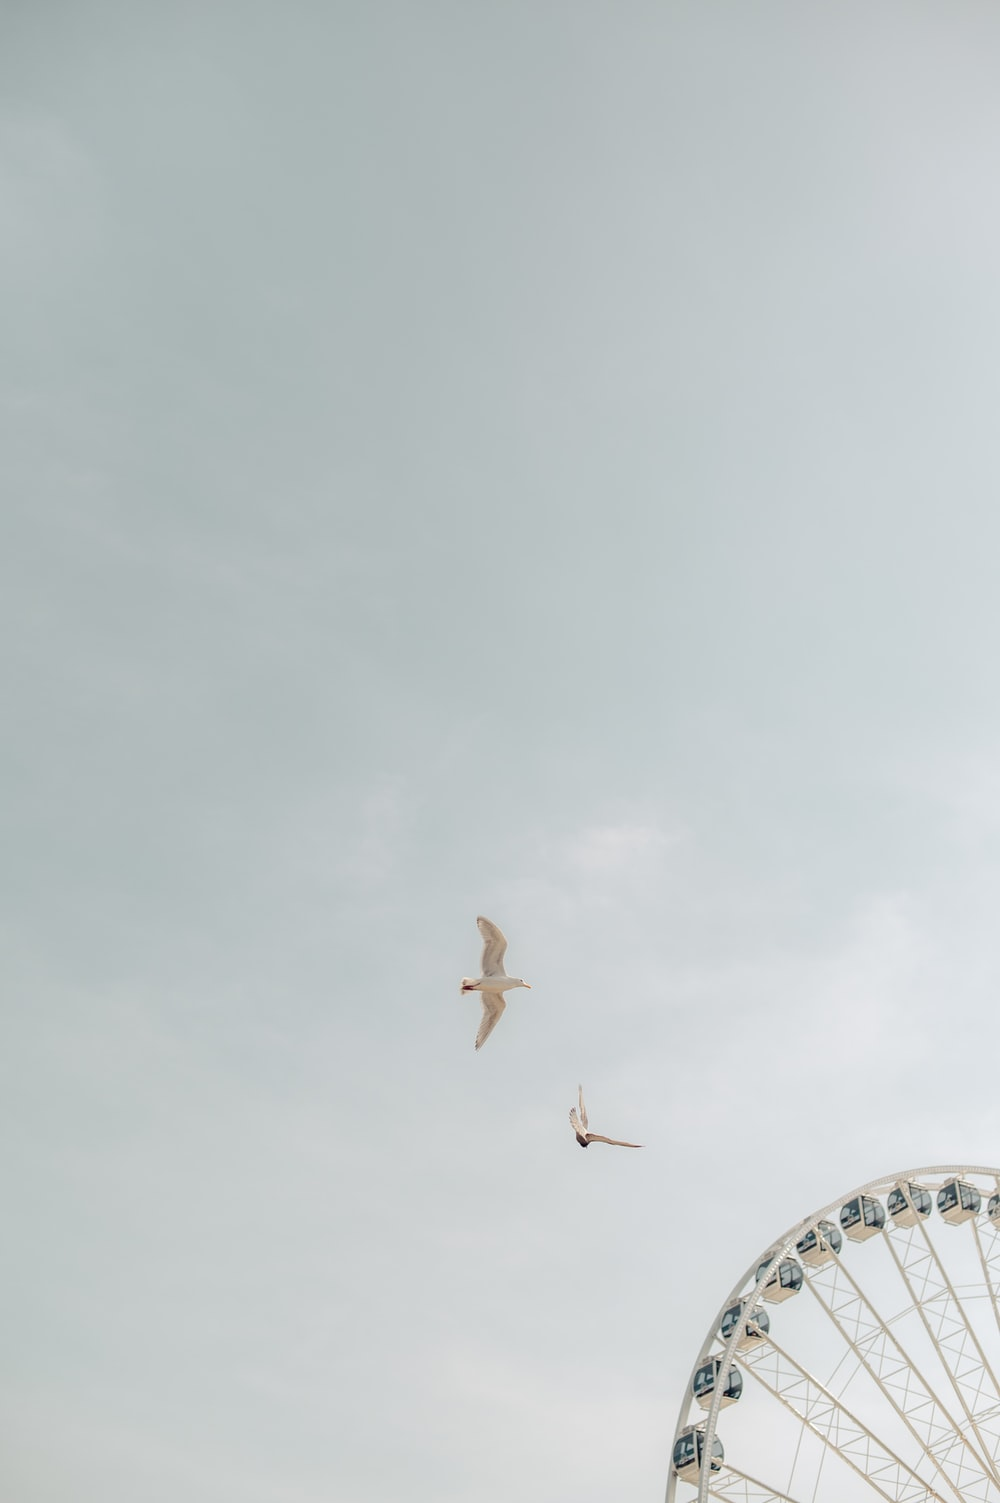 two birds on flight